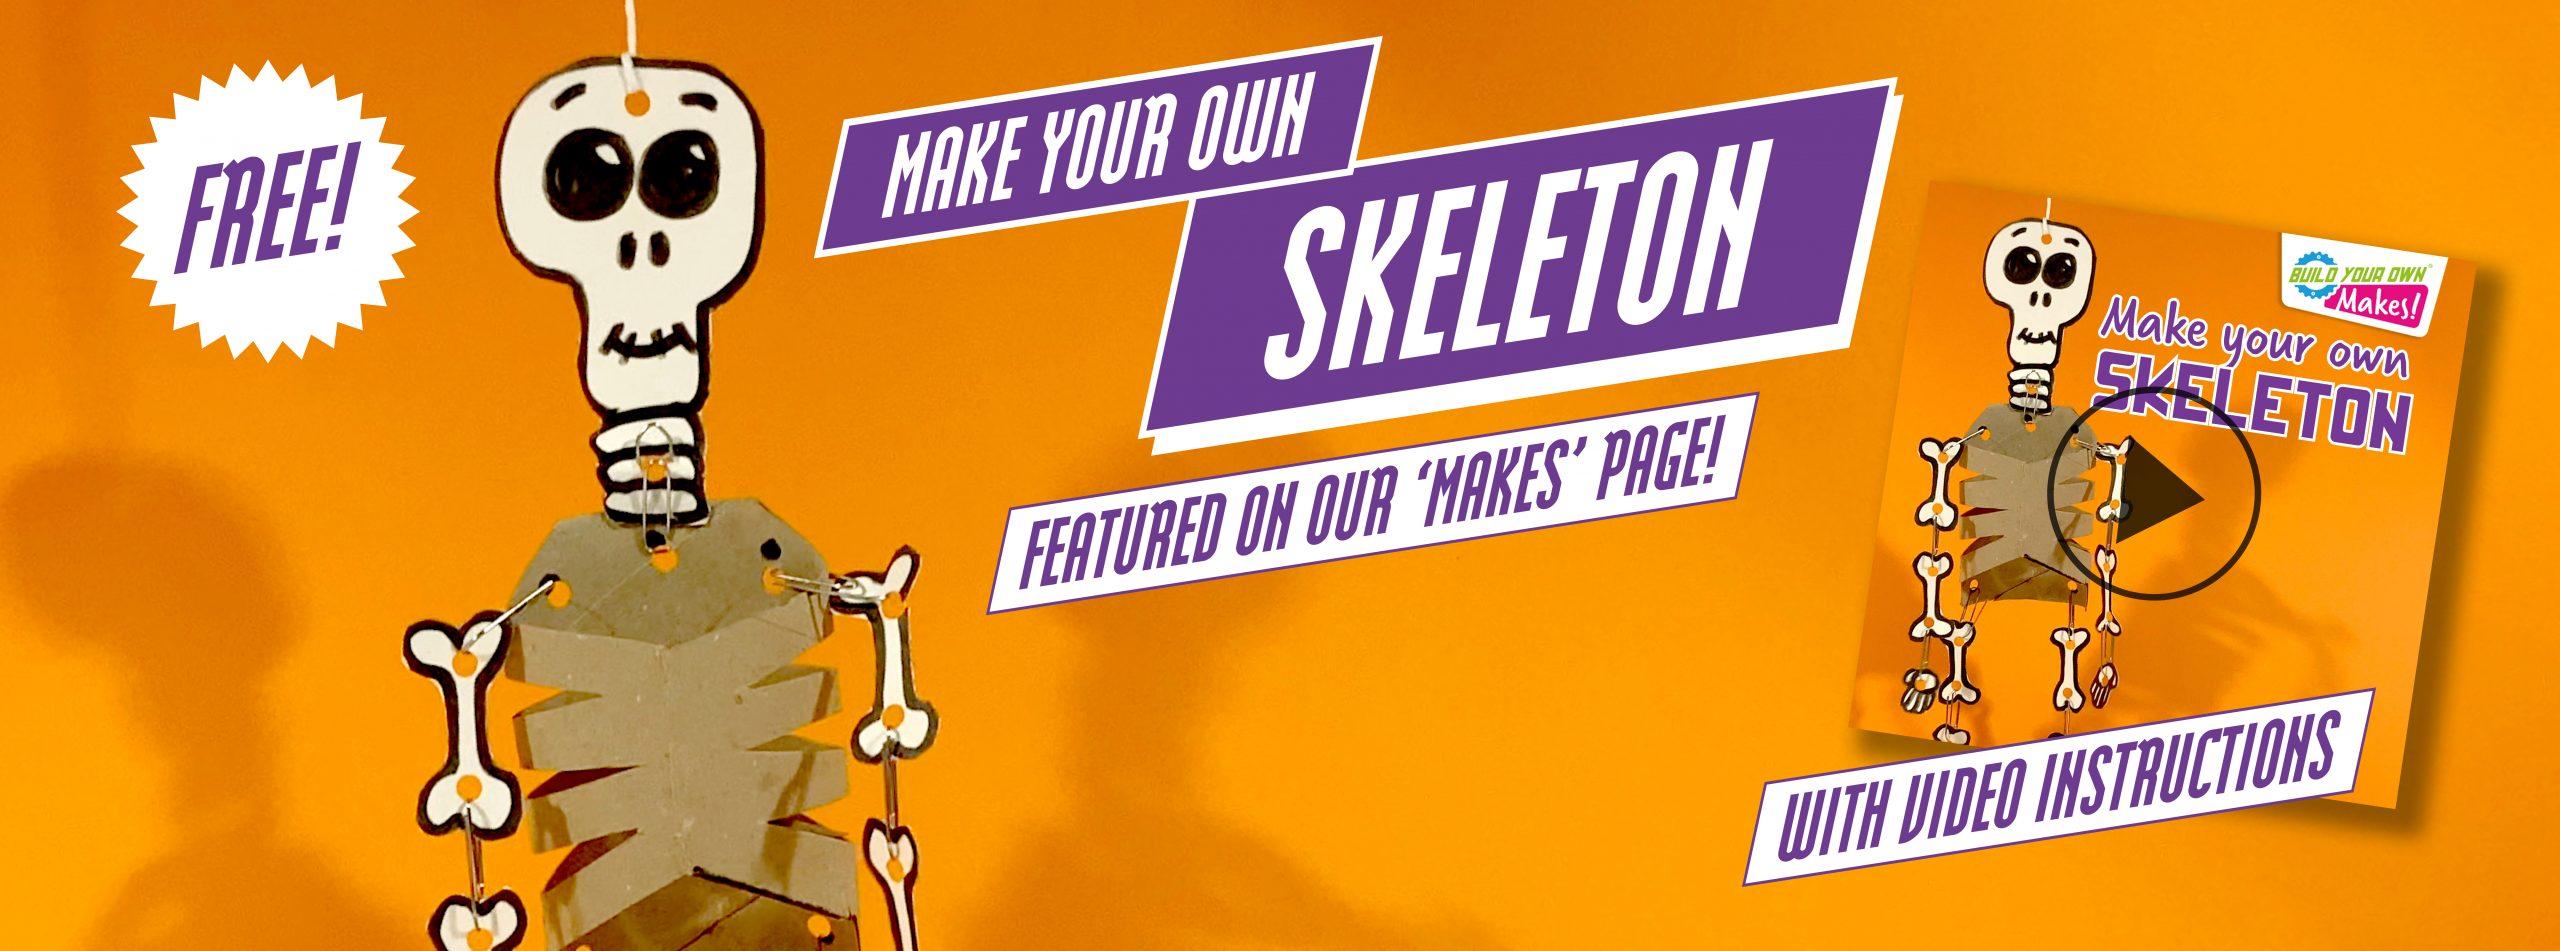 Skeleton web banner V2 20.10.21